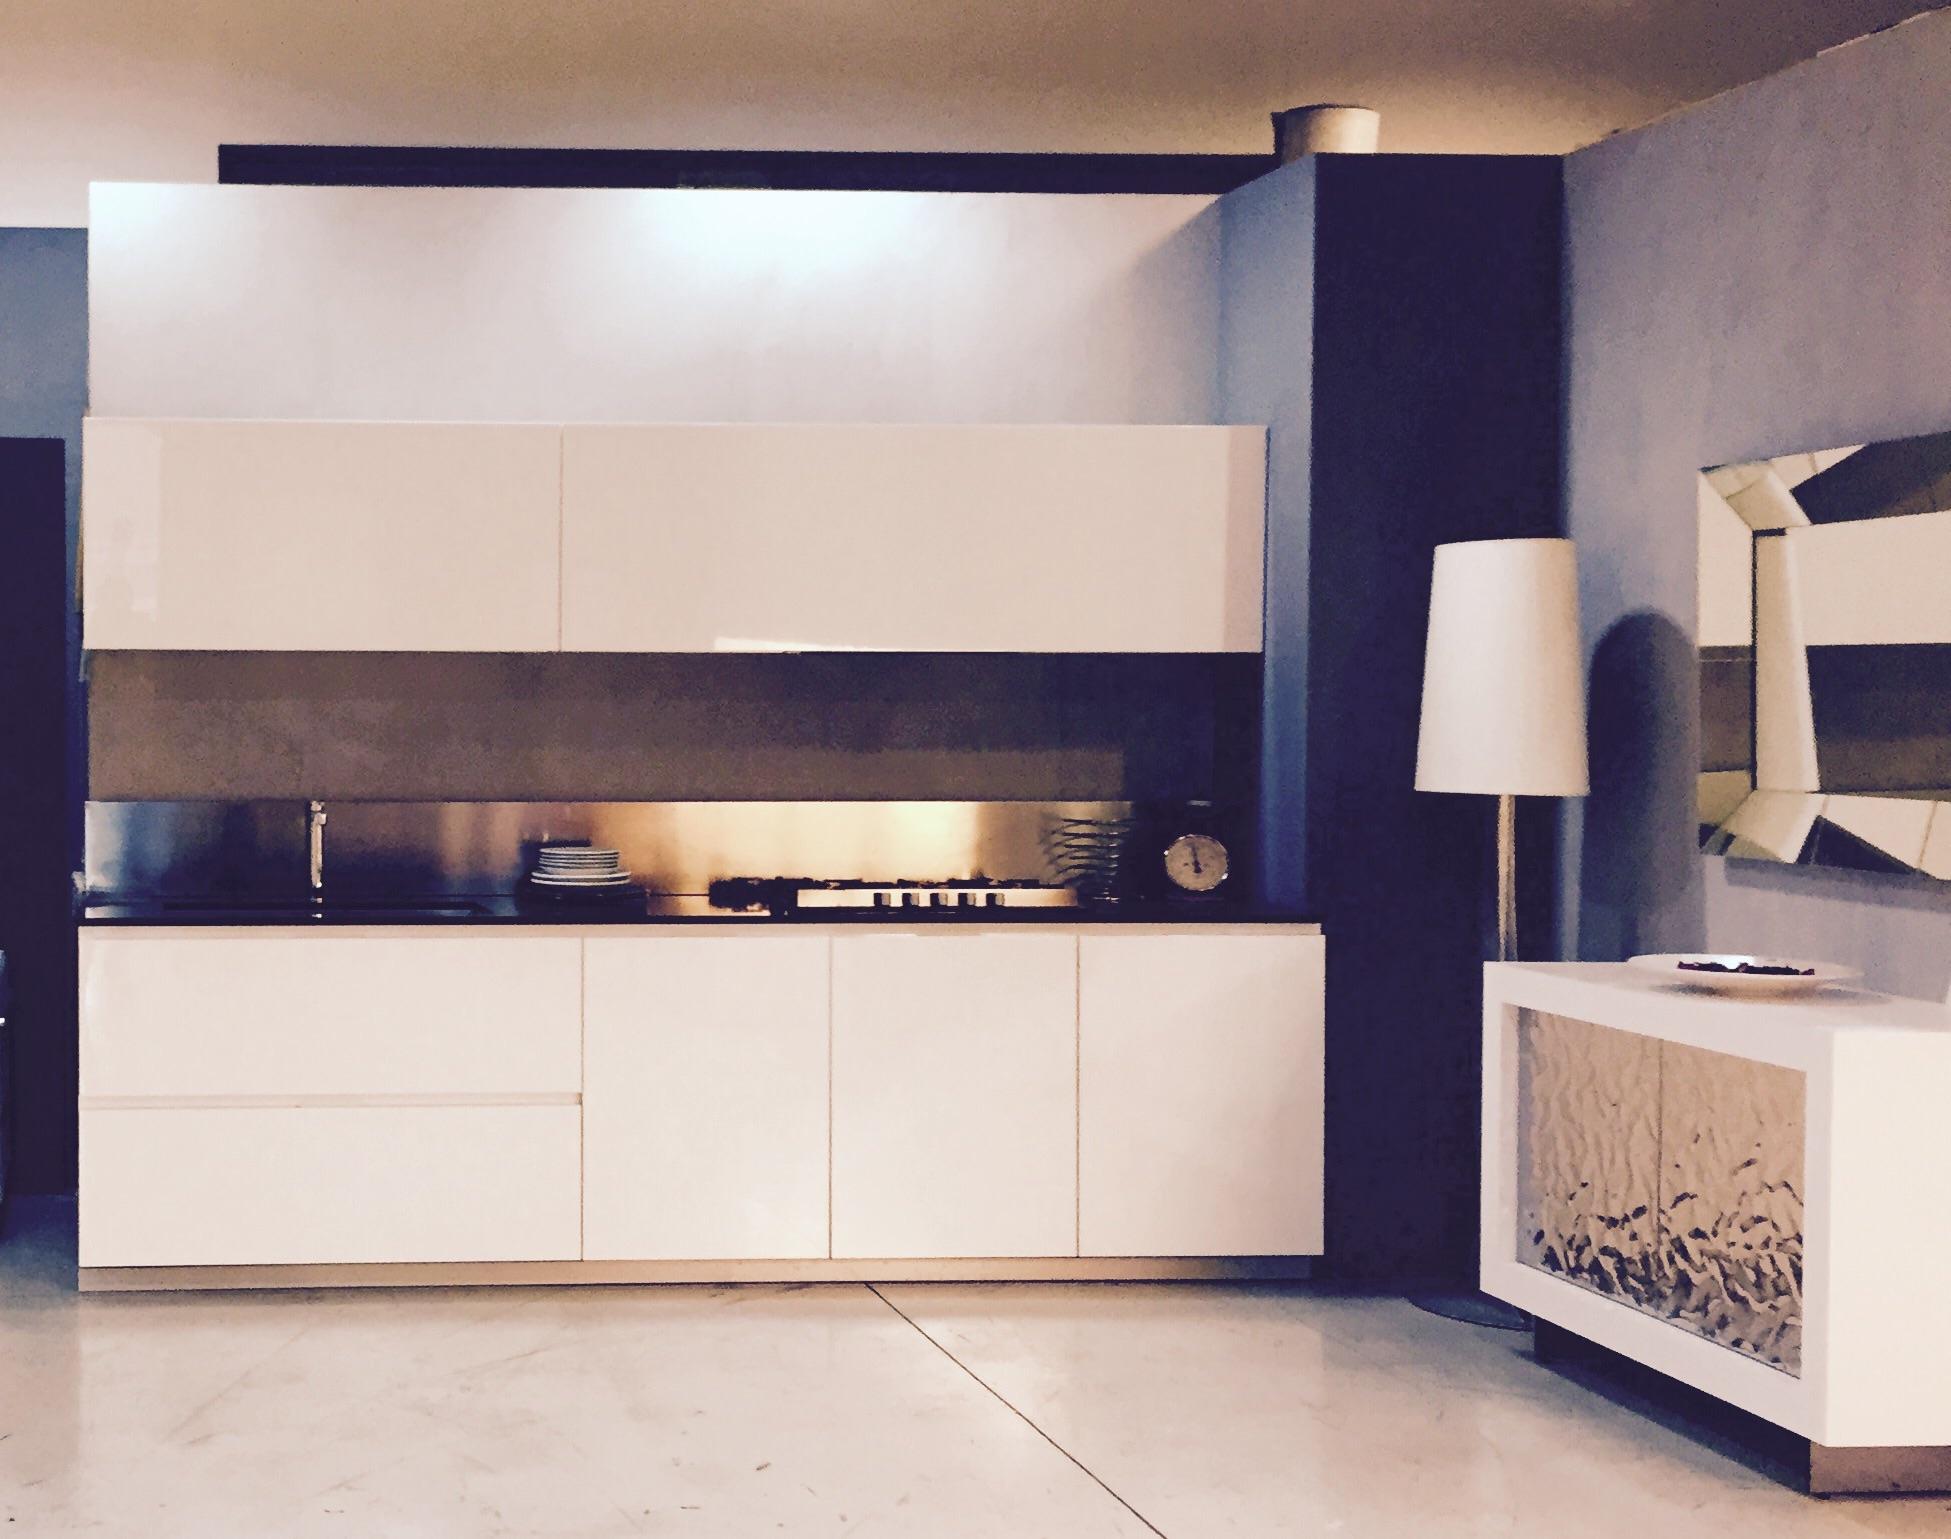 Cucina modulnova design laccato lucido bianca cucine a prezzi scontati - Modulnova cucine prezzi ...